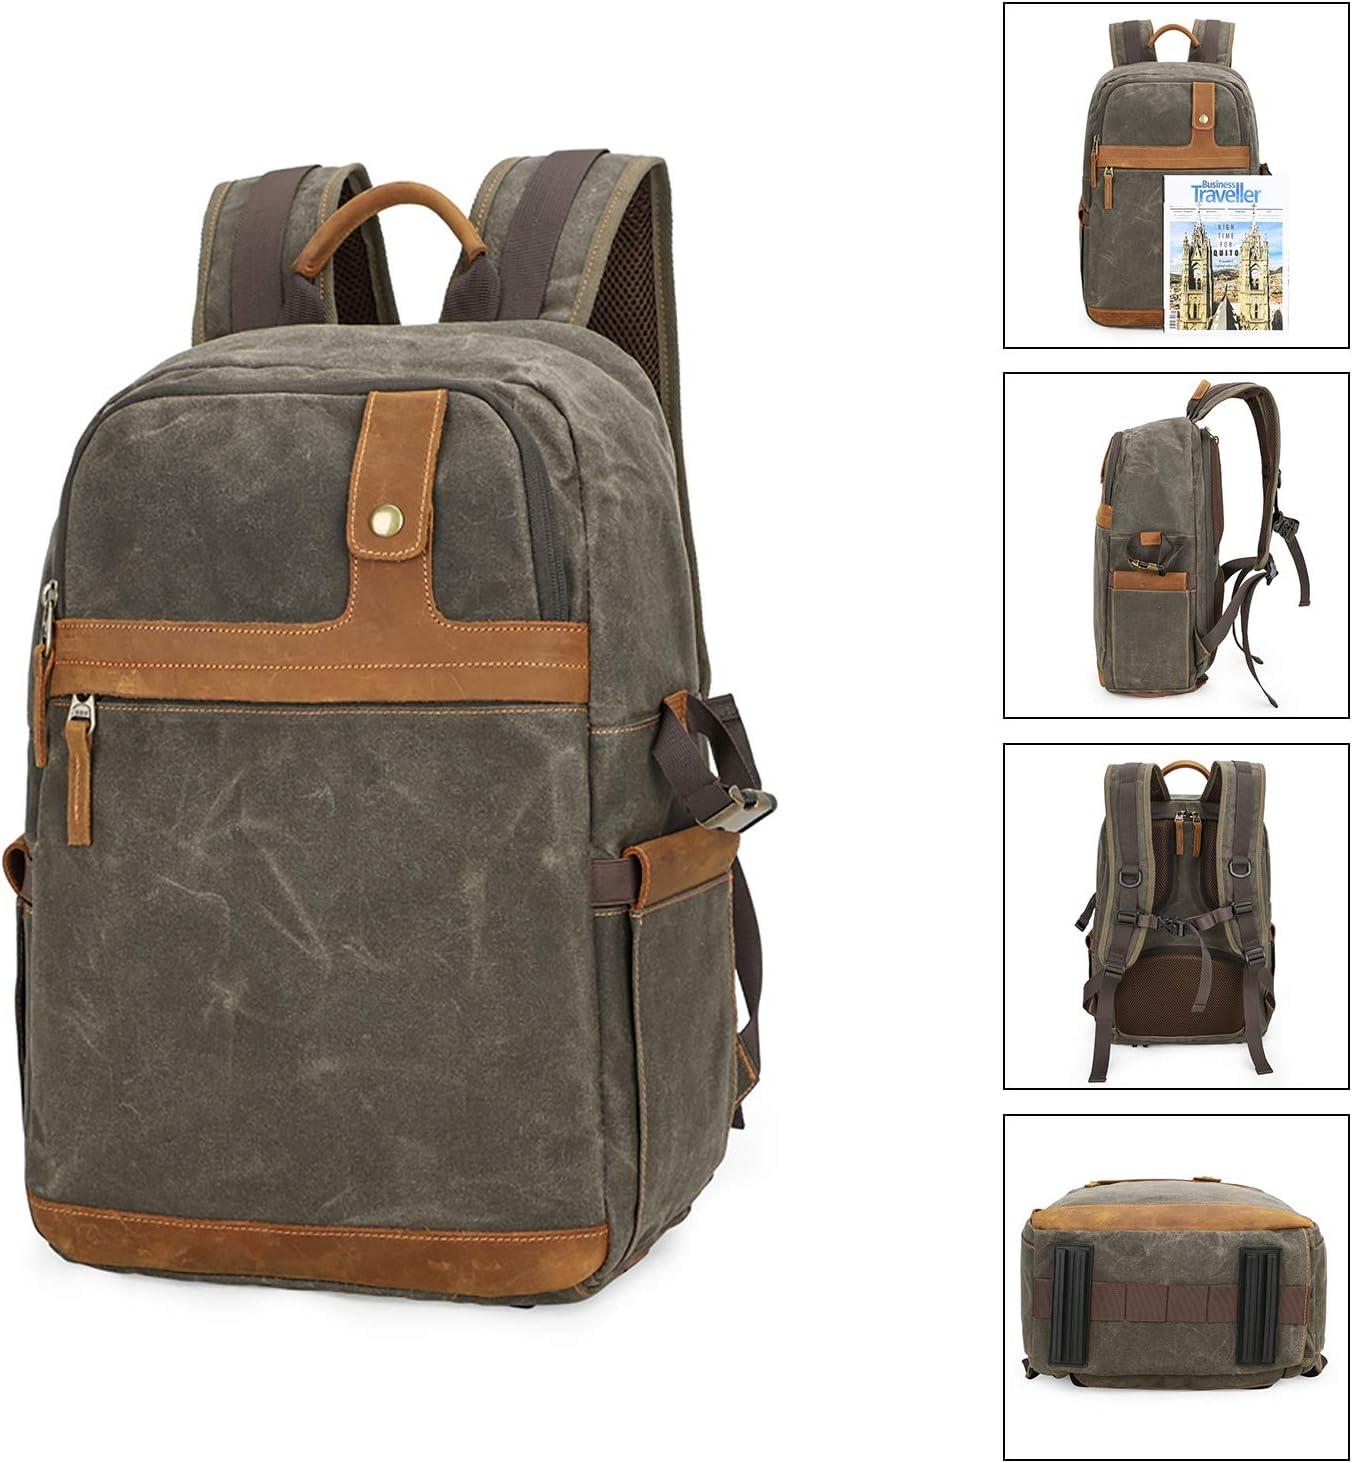 Outdoor Camera//Travel Backpack DSLR Camera Case Camera//Lens//Tripod//Laptop Bag Pitch Green